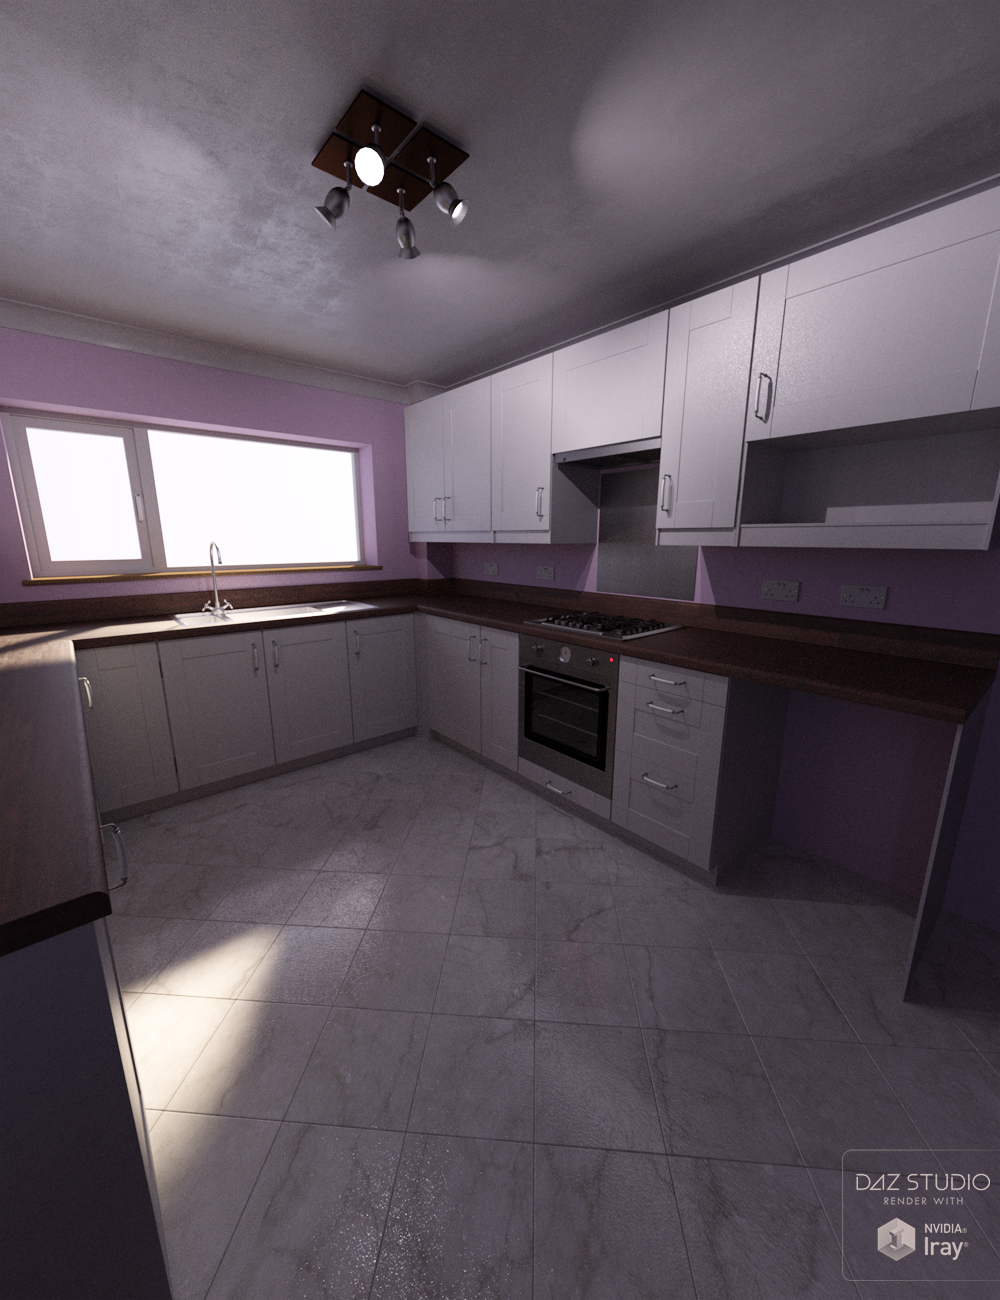 Northern Terrace Kitchen by: David BrinnenForbiddenWhispers, 3D Models by Daz 3D